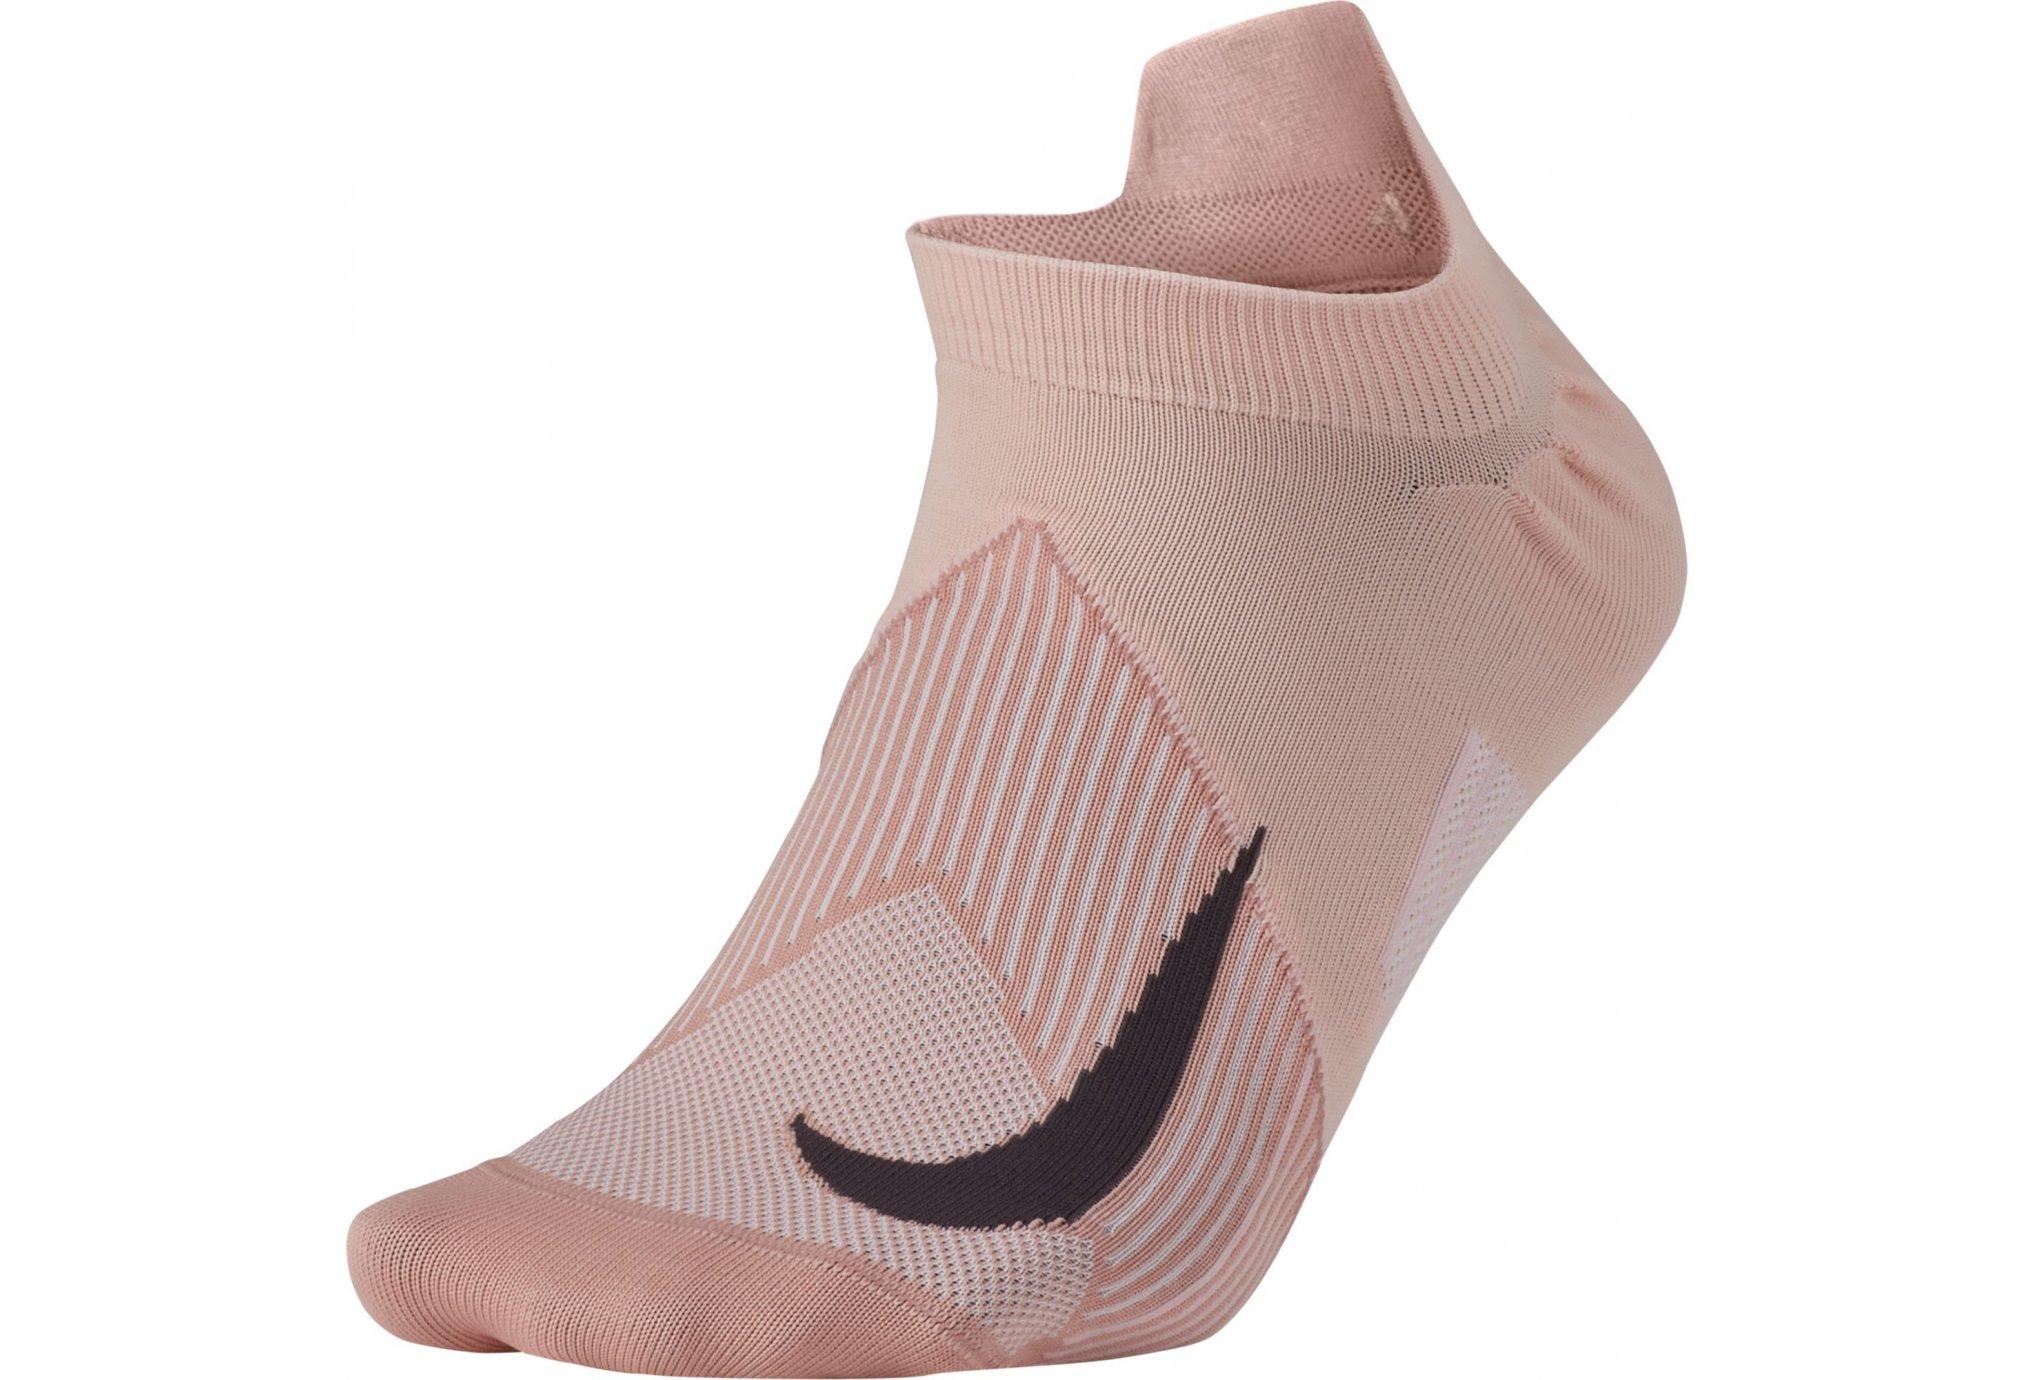 Nike Elite Lightweight No-Show Chaussettes